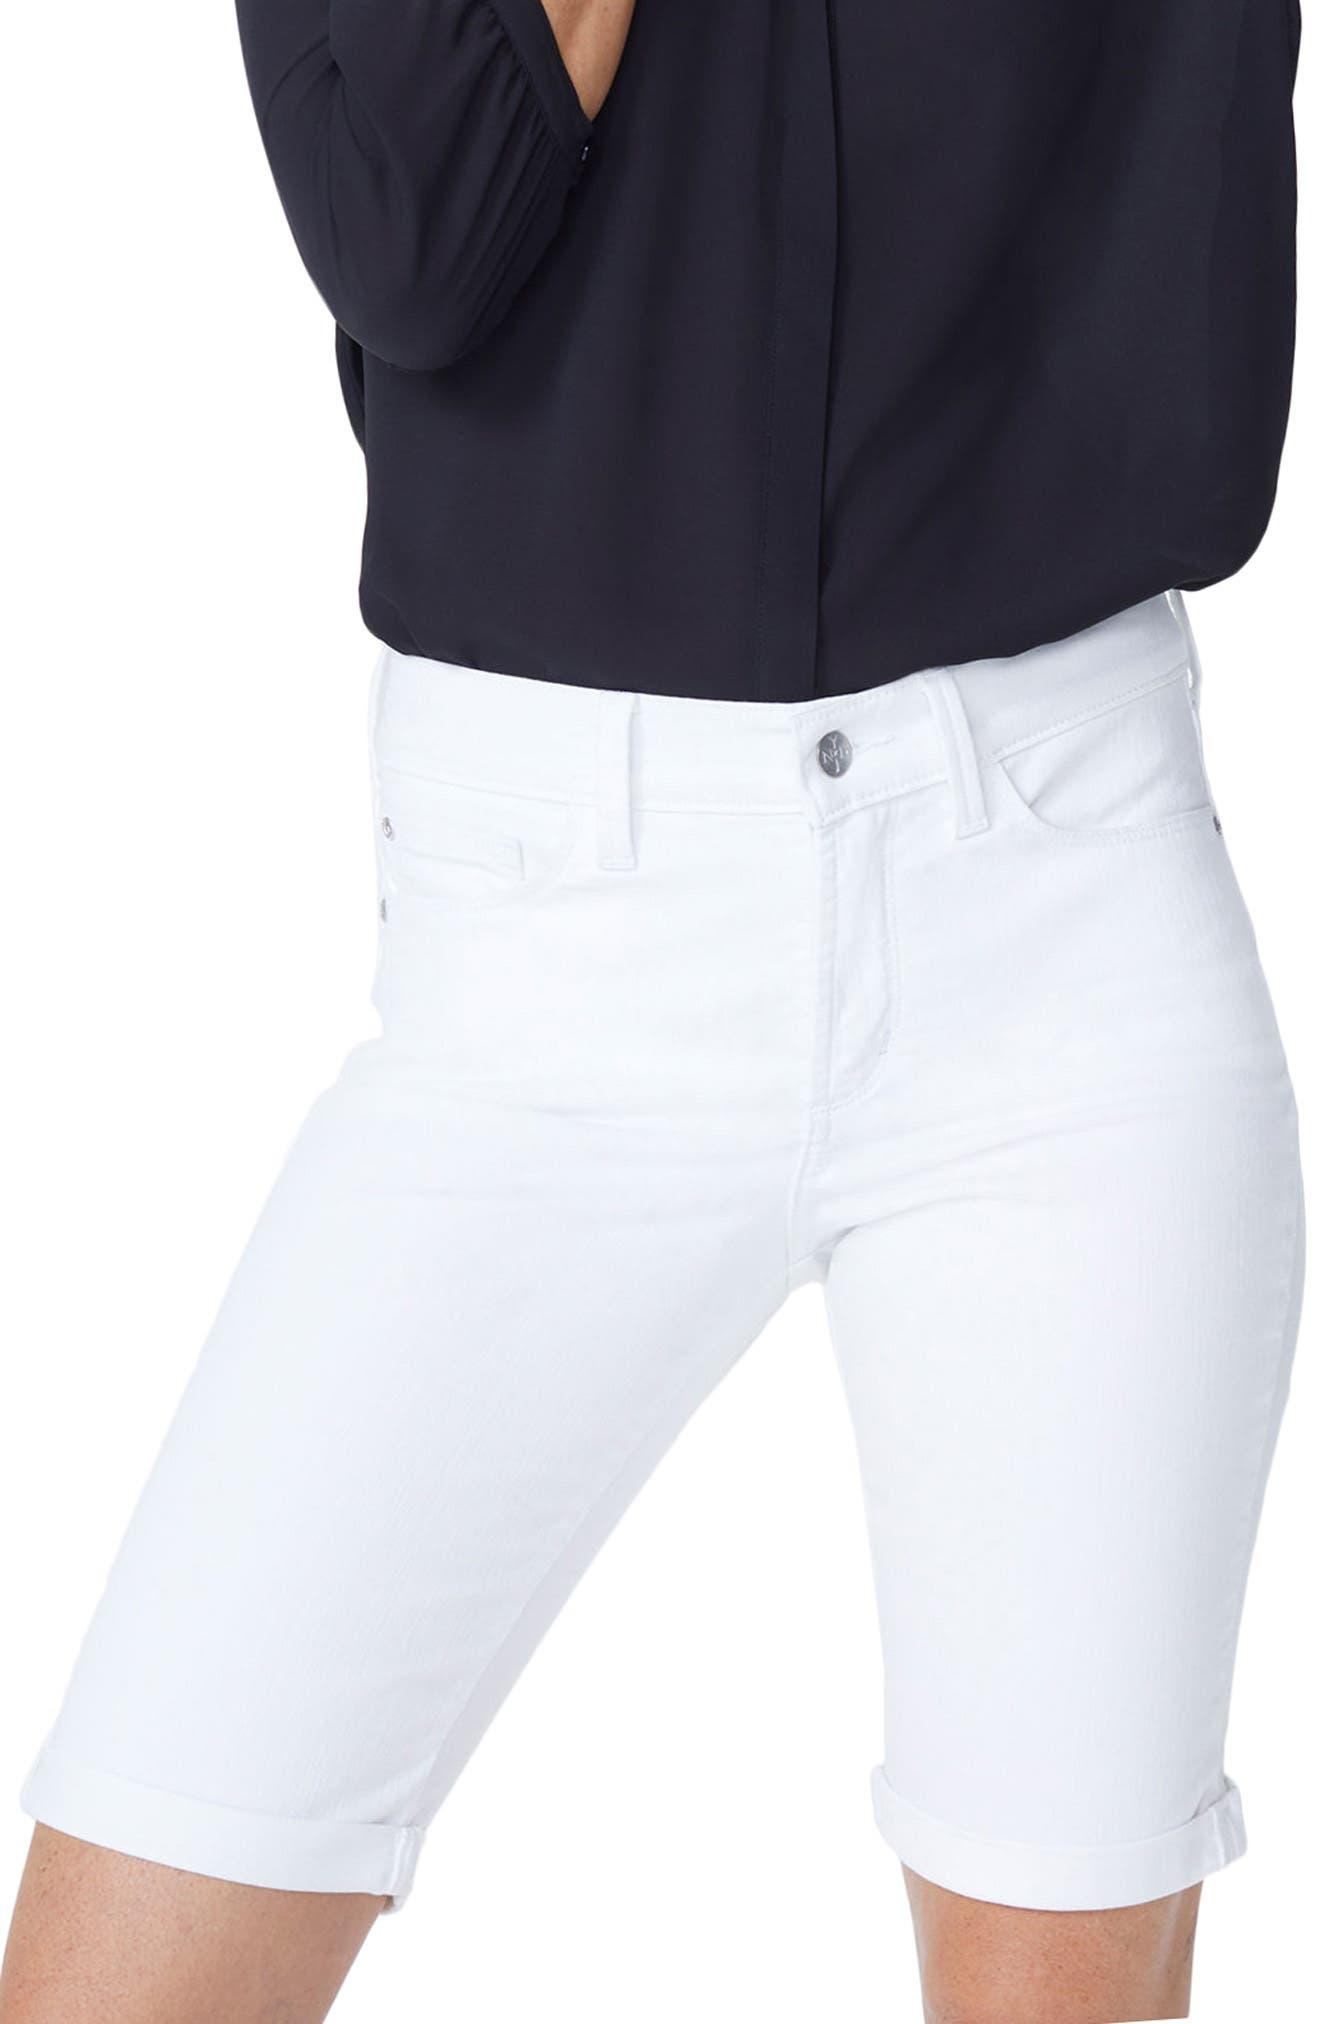 Main Image - NYDJ Briella Roll Cuff Bermuda Shorts